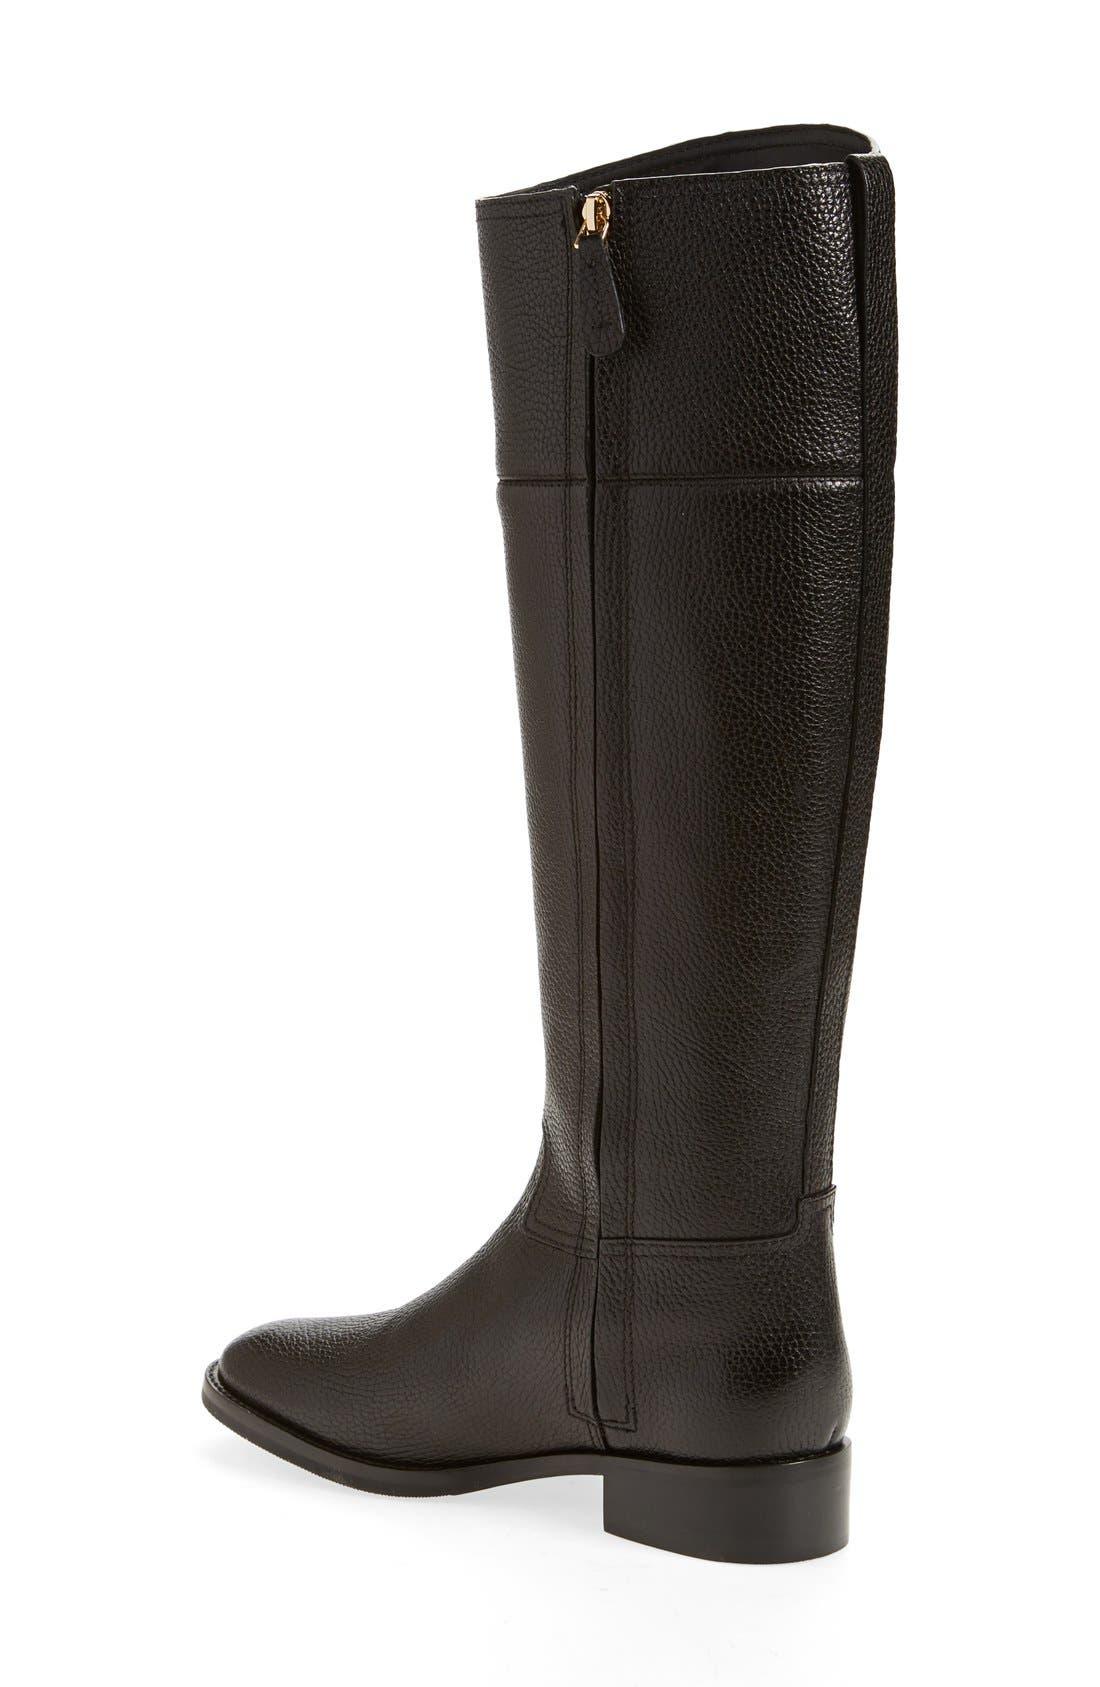 Alternate Image 2  - Tory Burch 'Junction' Riding Boot (Women) (Wide Calf)